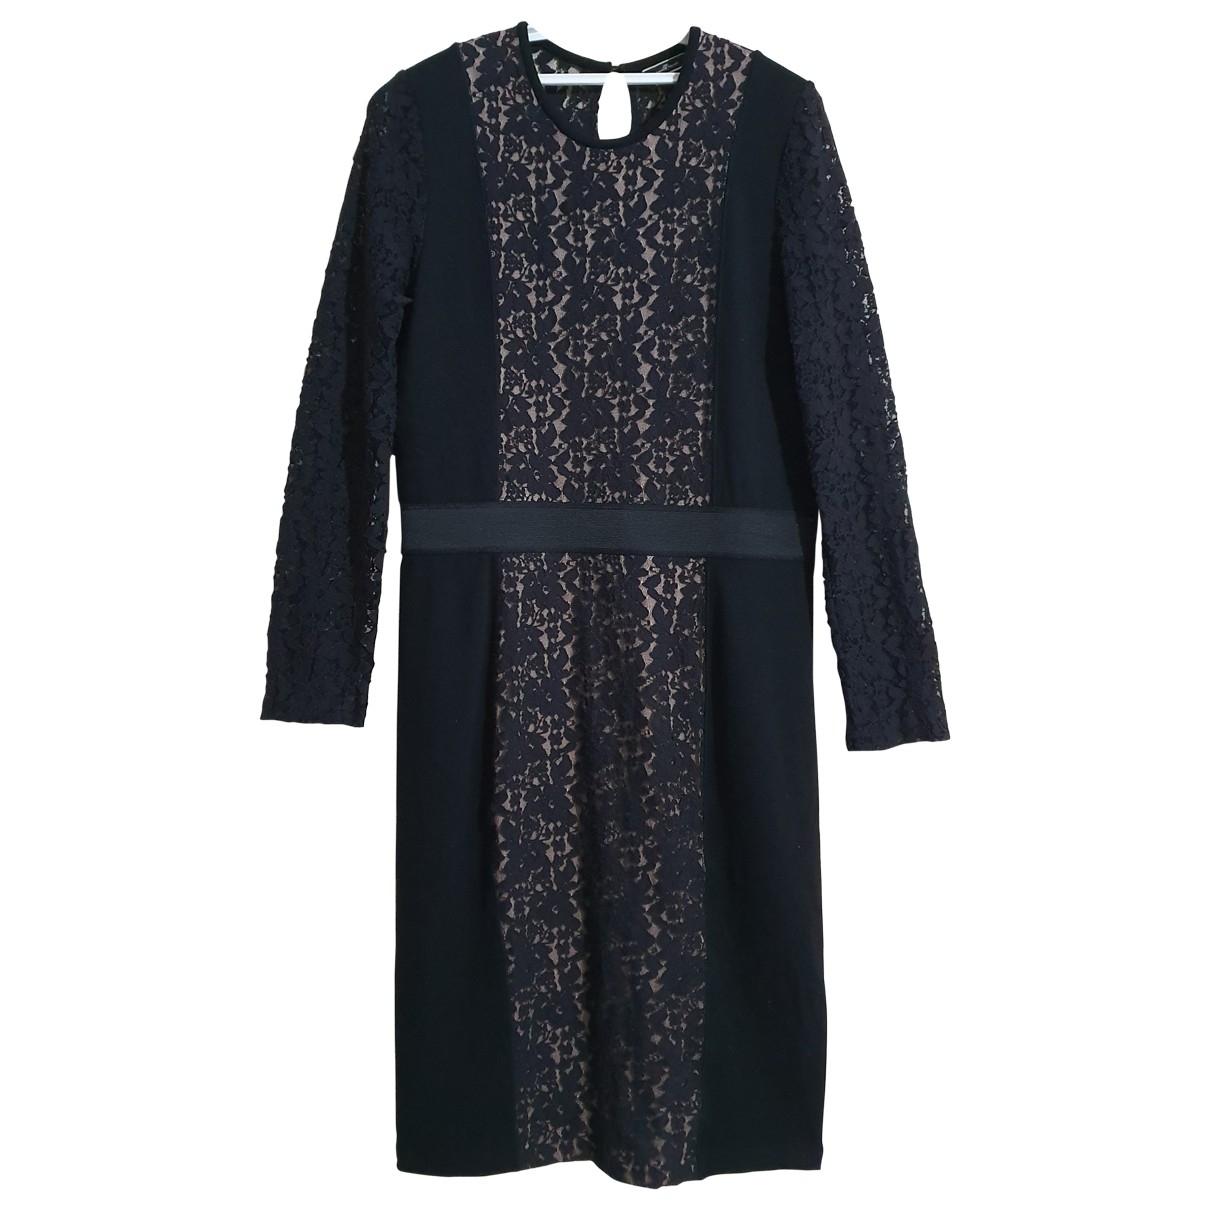 By Malene Birger \N Black dress for Women XL International